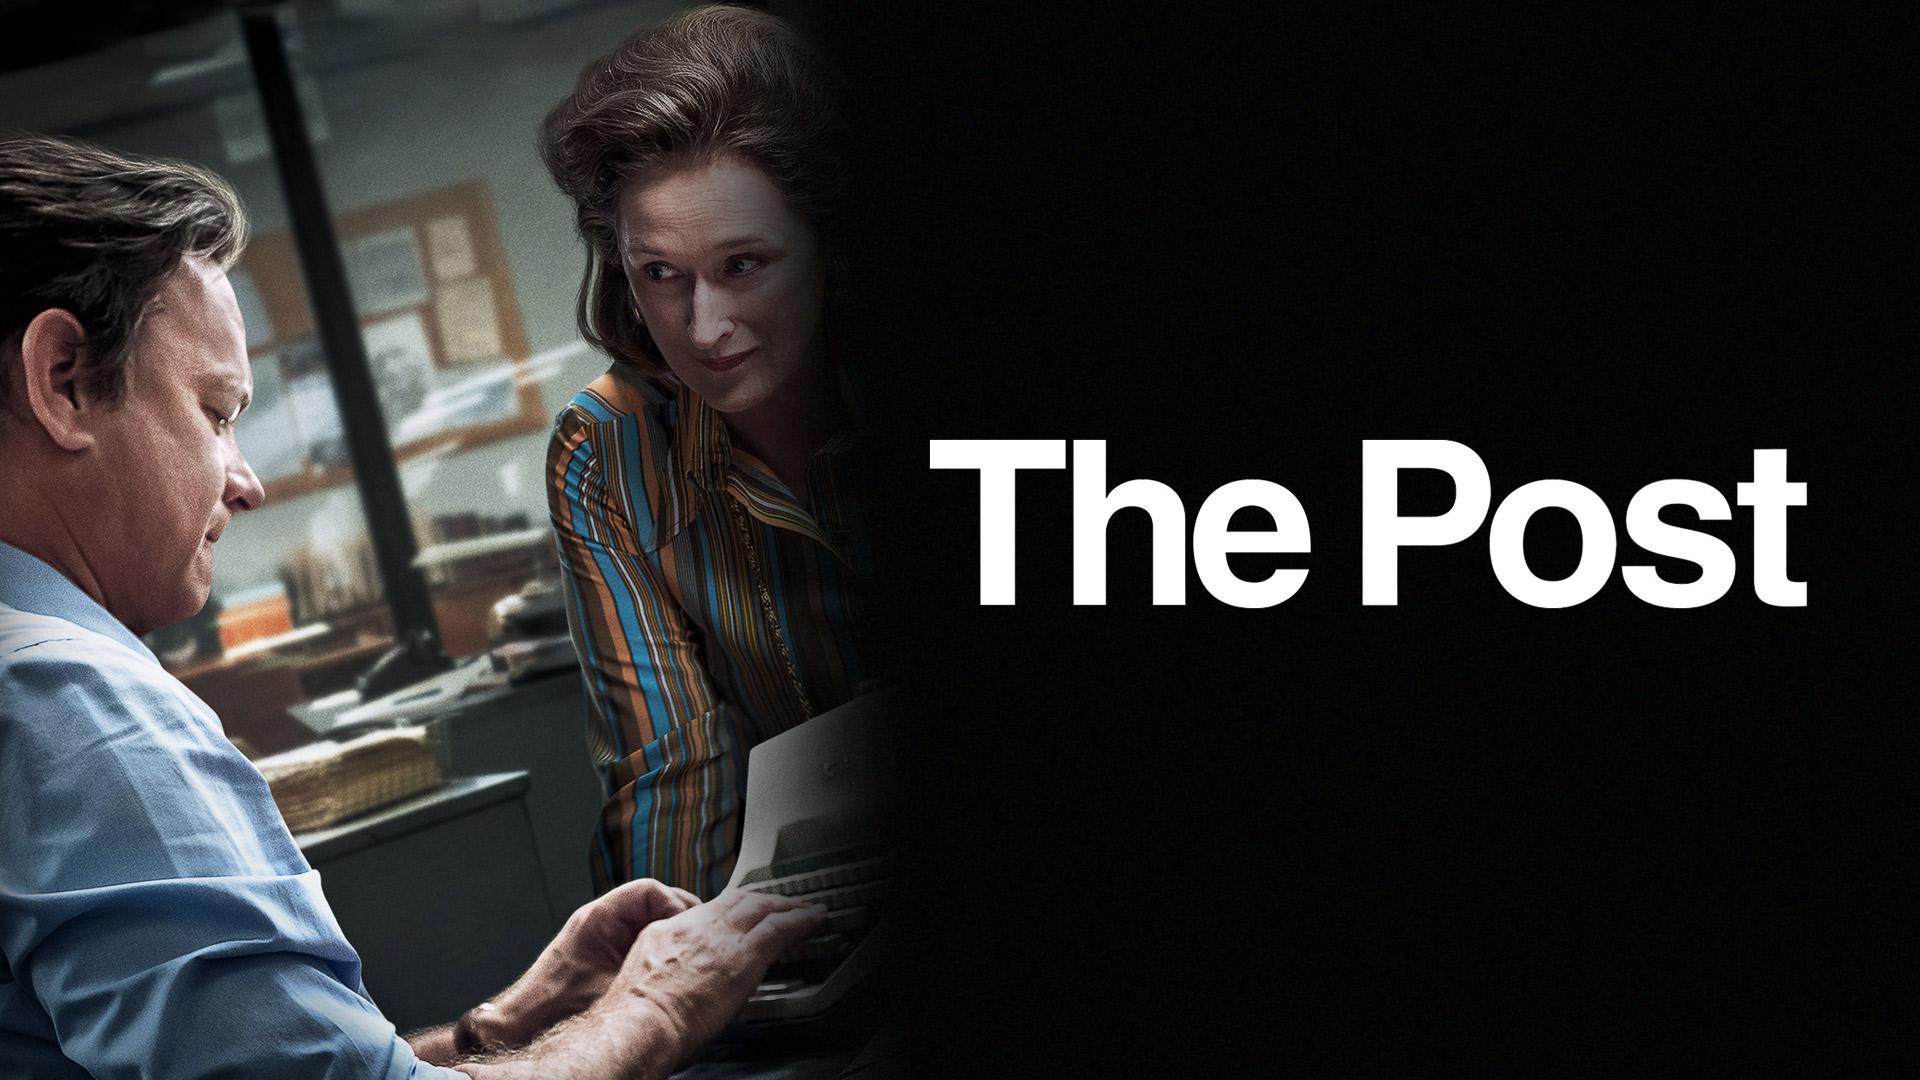 The Post (4K UHD)